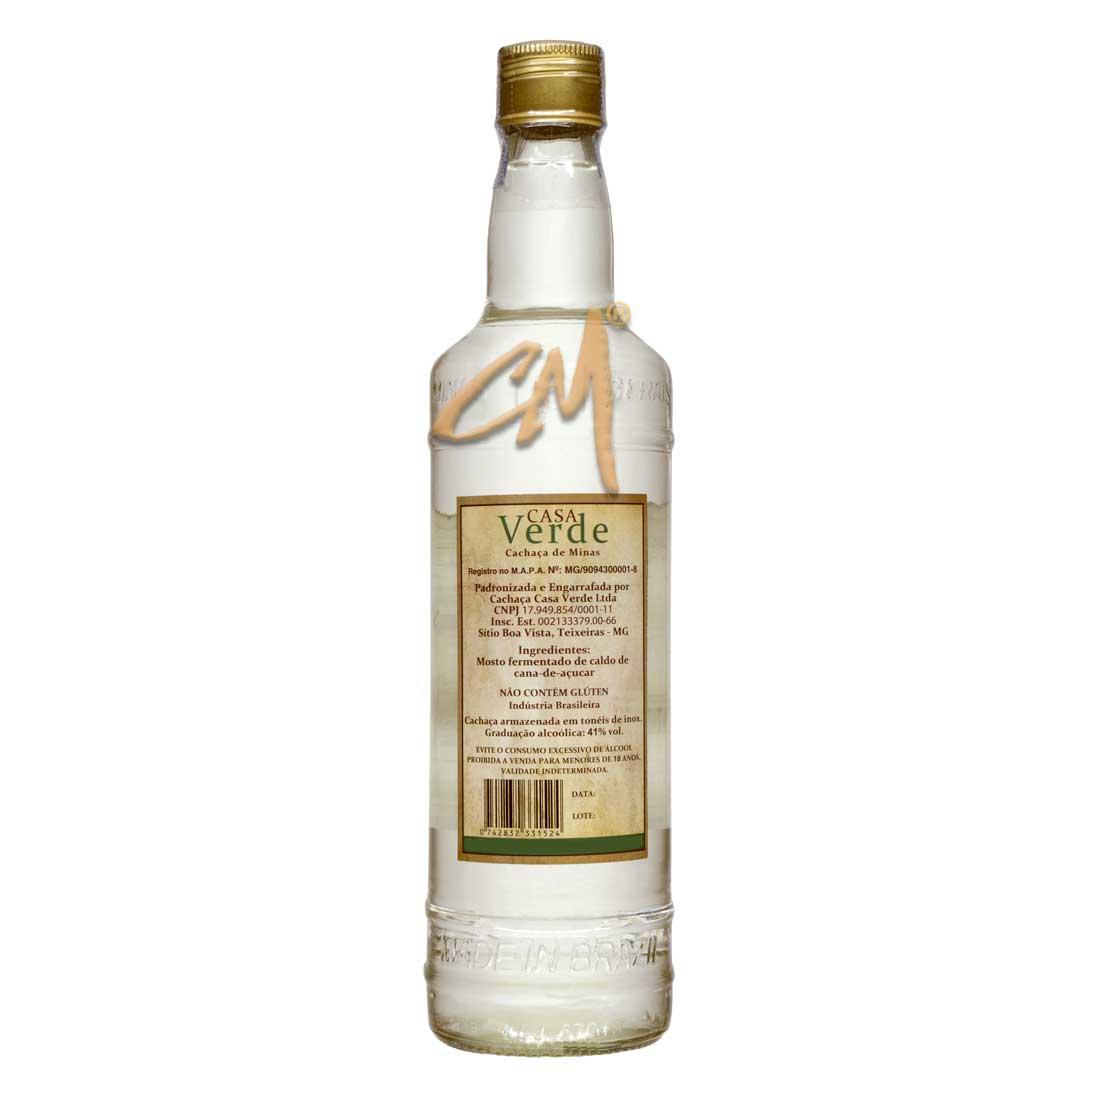 Cachaça Casa Verde Prata 670 ml (Teixeiras - MG)